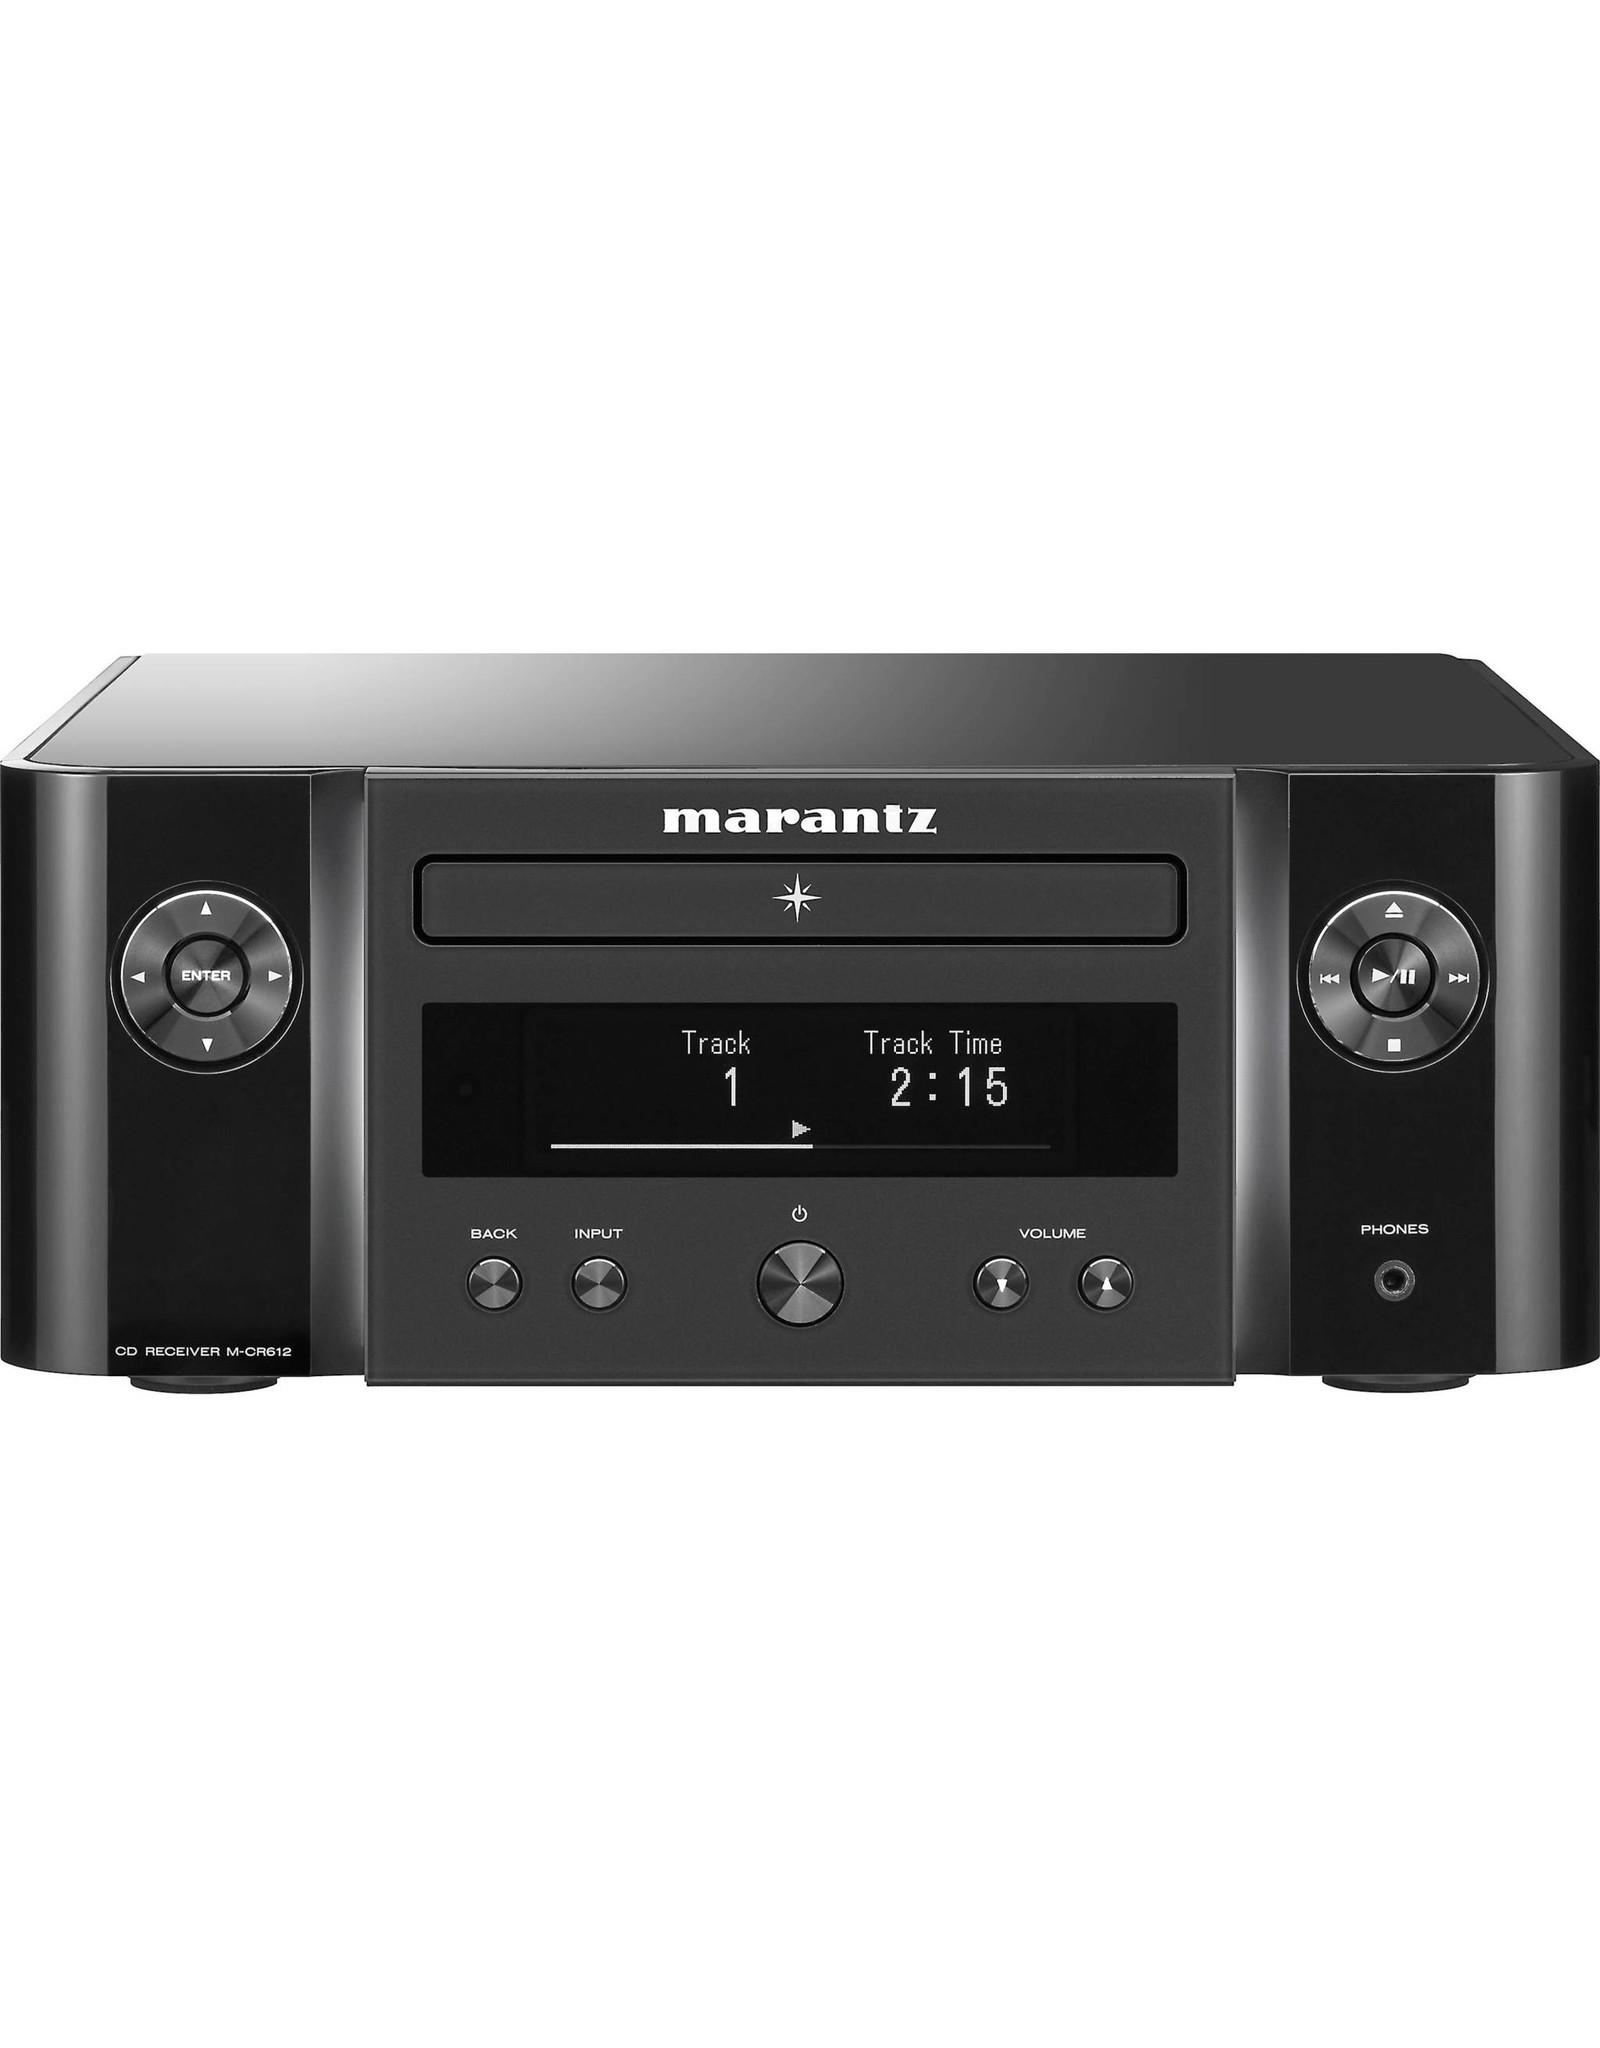 Marantz Marantz M-CR612 Network Mini CD Receiver (No Speakers)